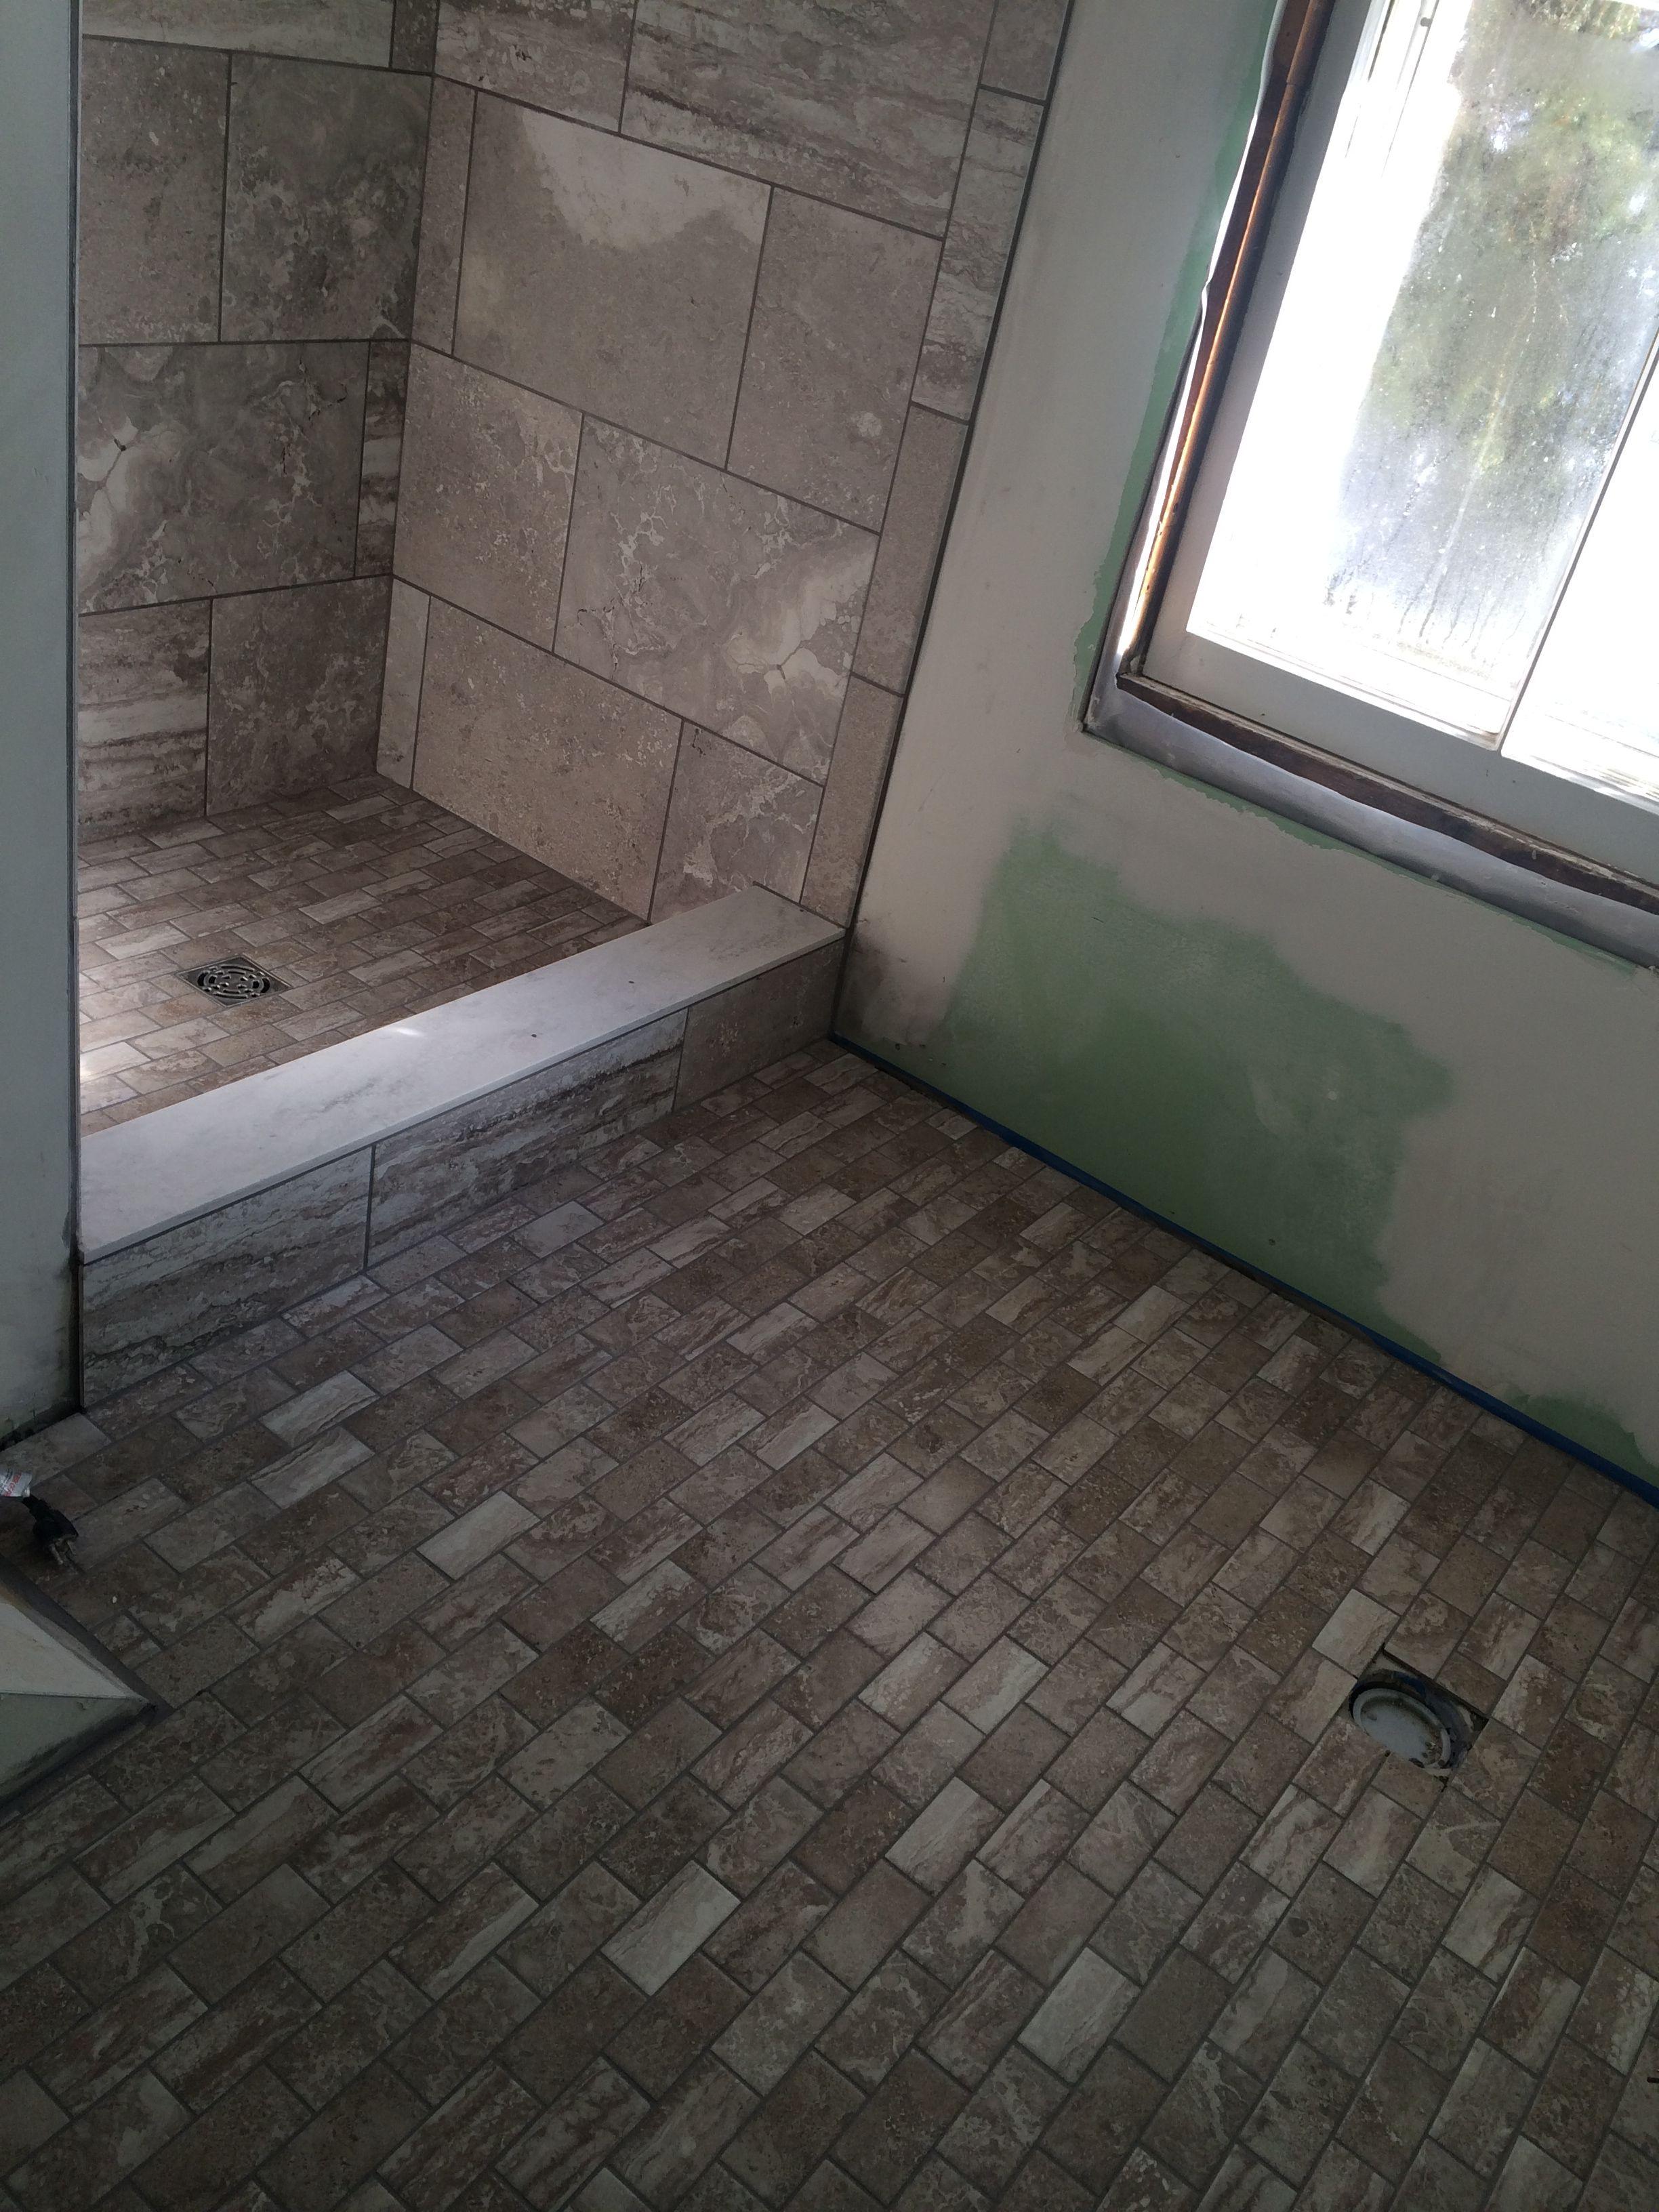 Shower walls daltile exquisite silver stone in12x18 for Daltile bathroom tile designs